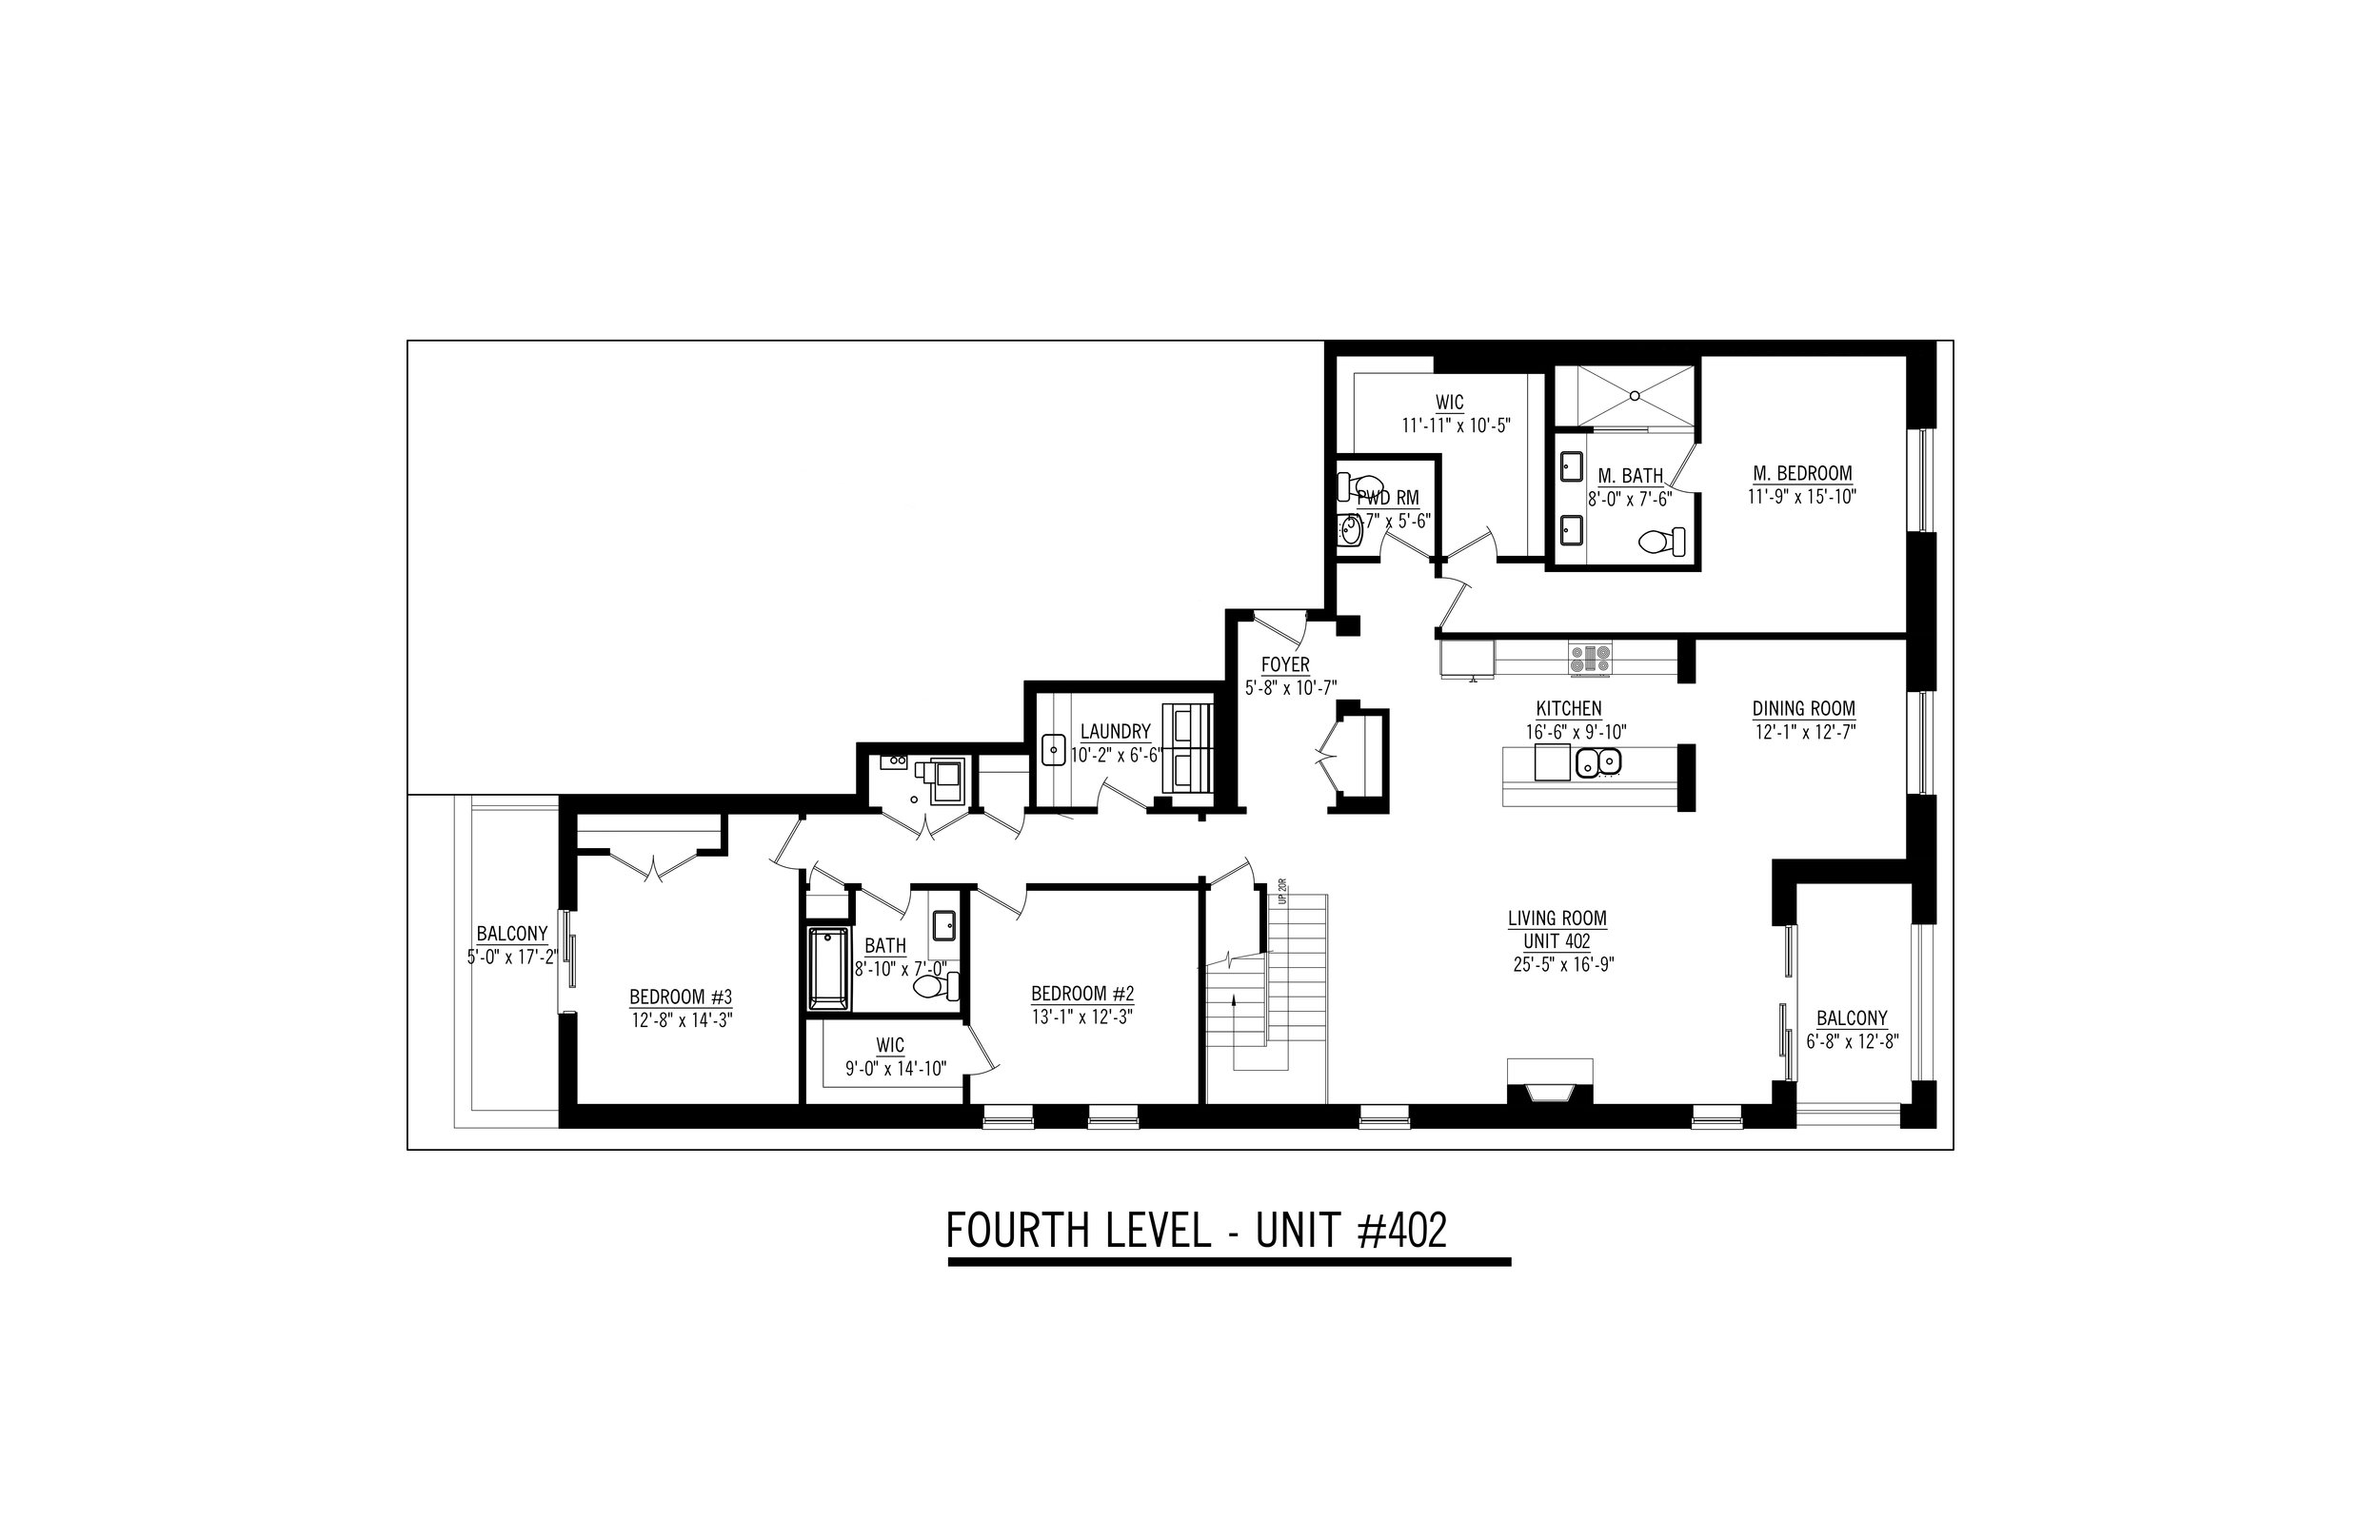 3150 SOUTHPORT - Final Marketing Plans 81618-17.jpg